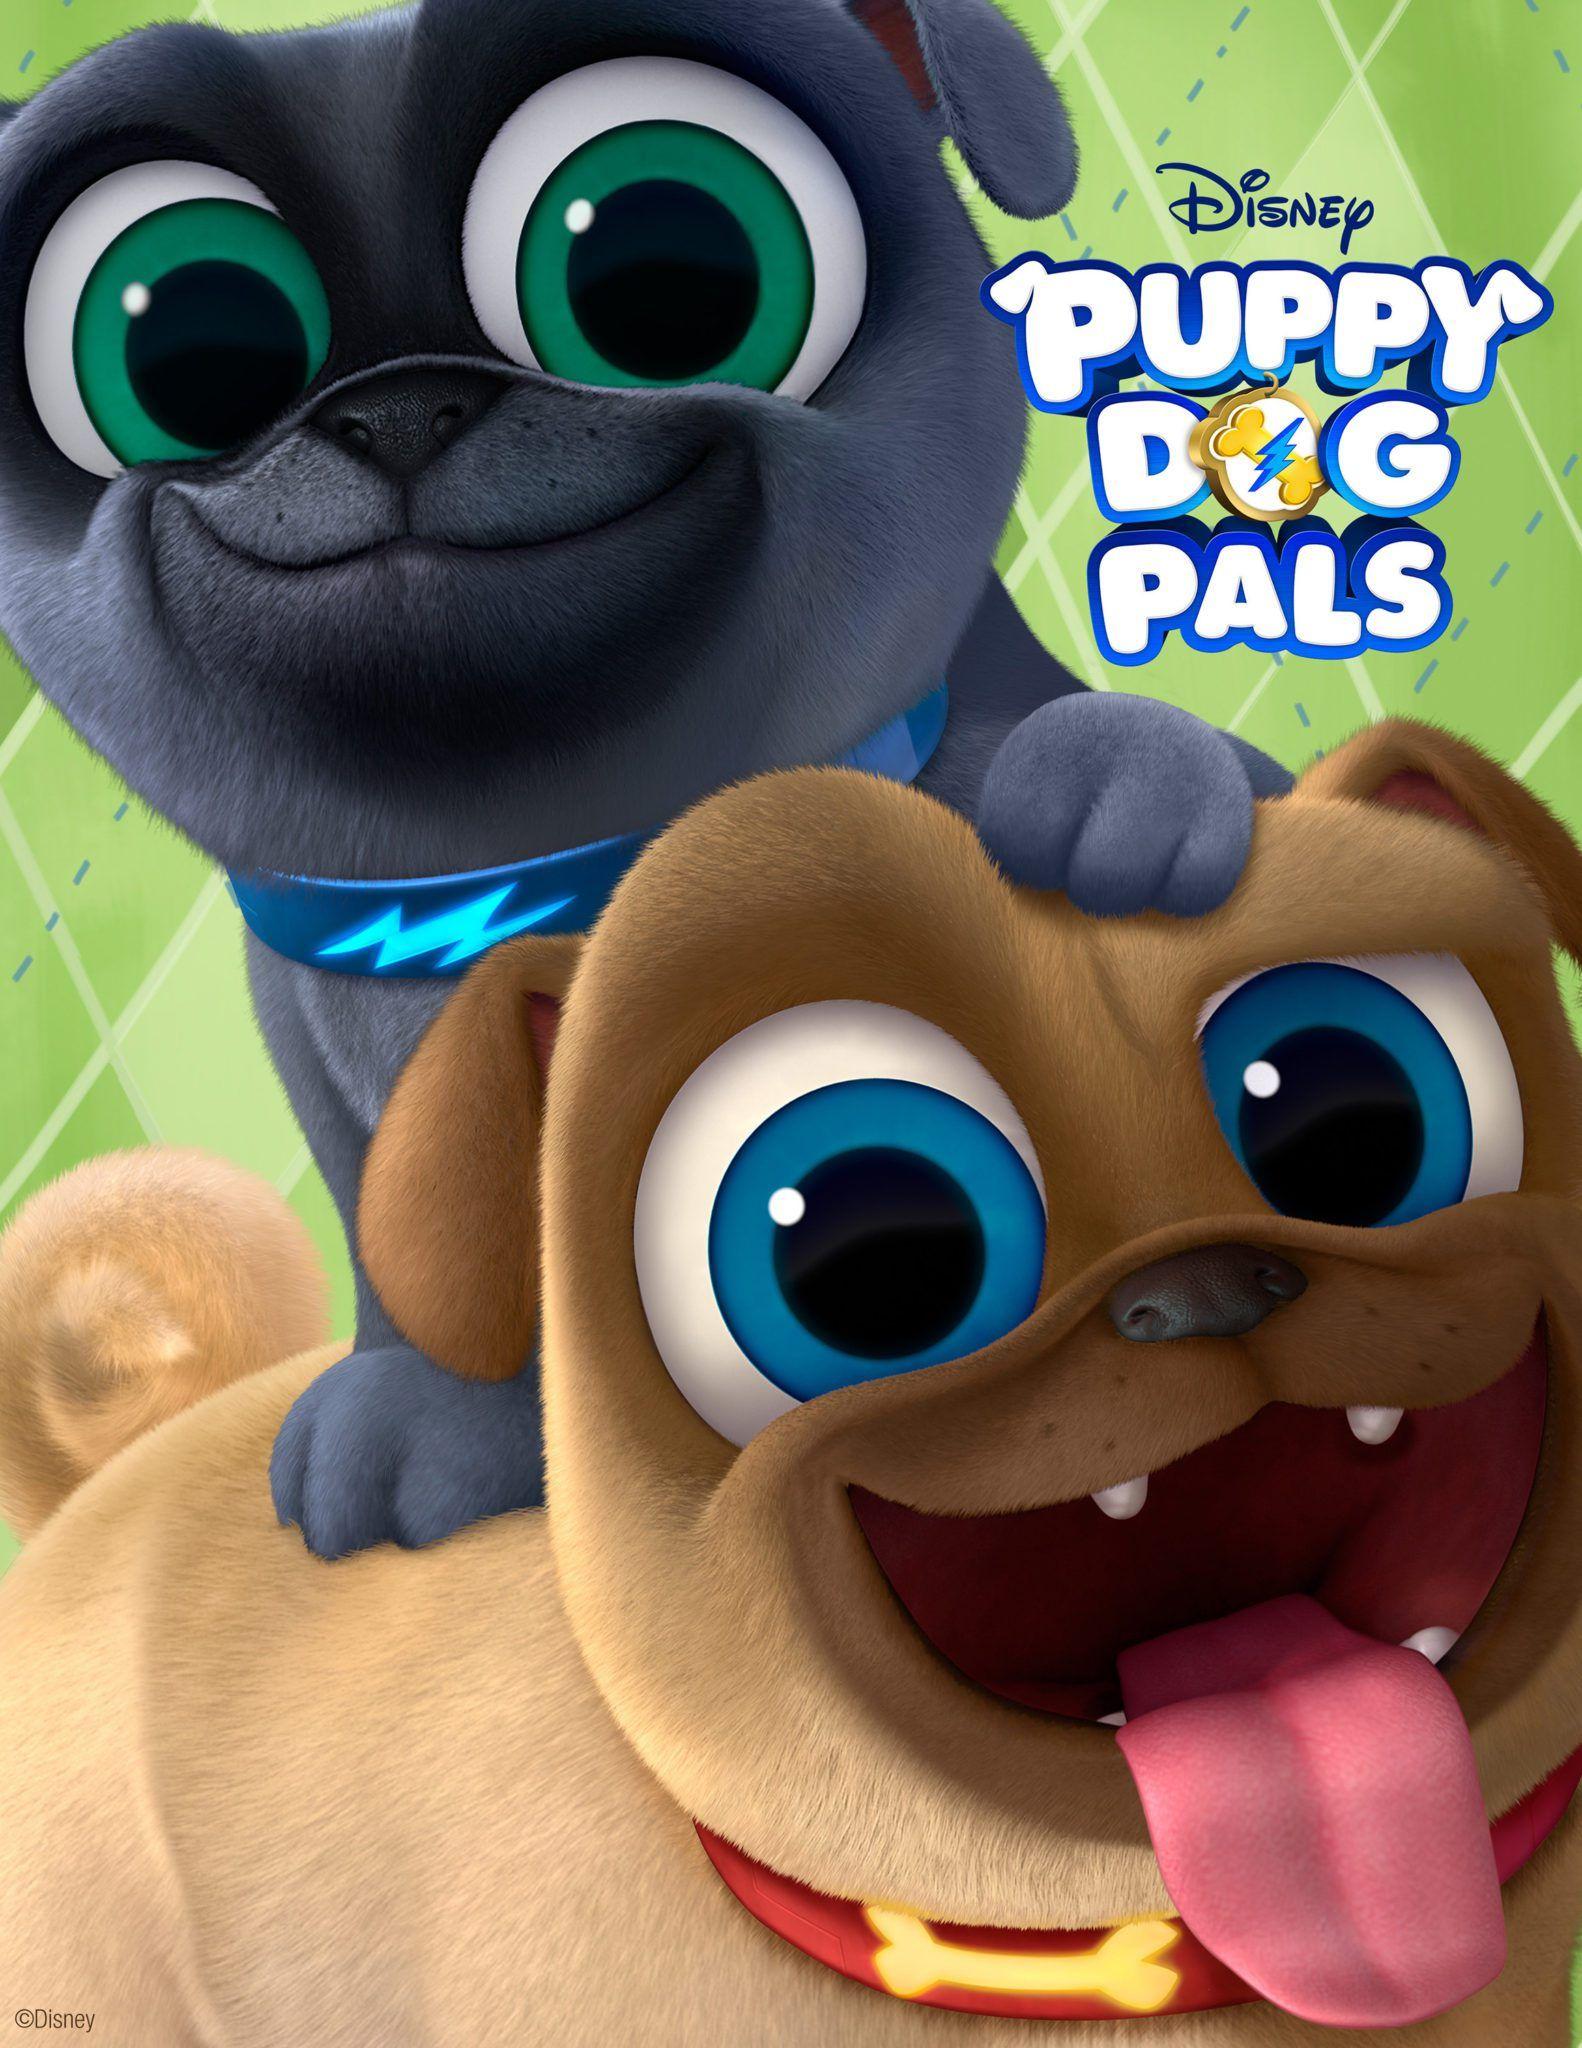 Disneyjunior S Puppy Dog Pals Embark On A Thrill Seeking